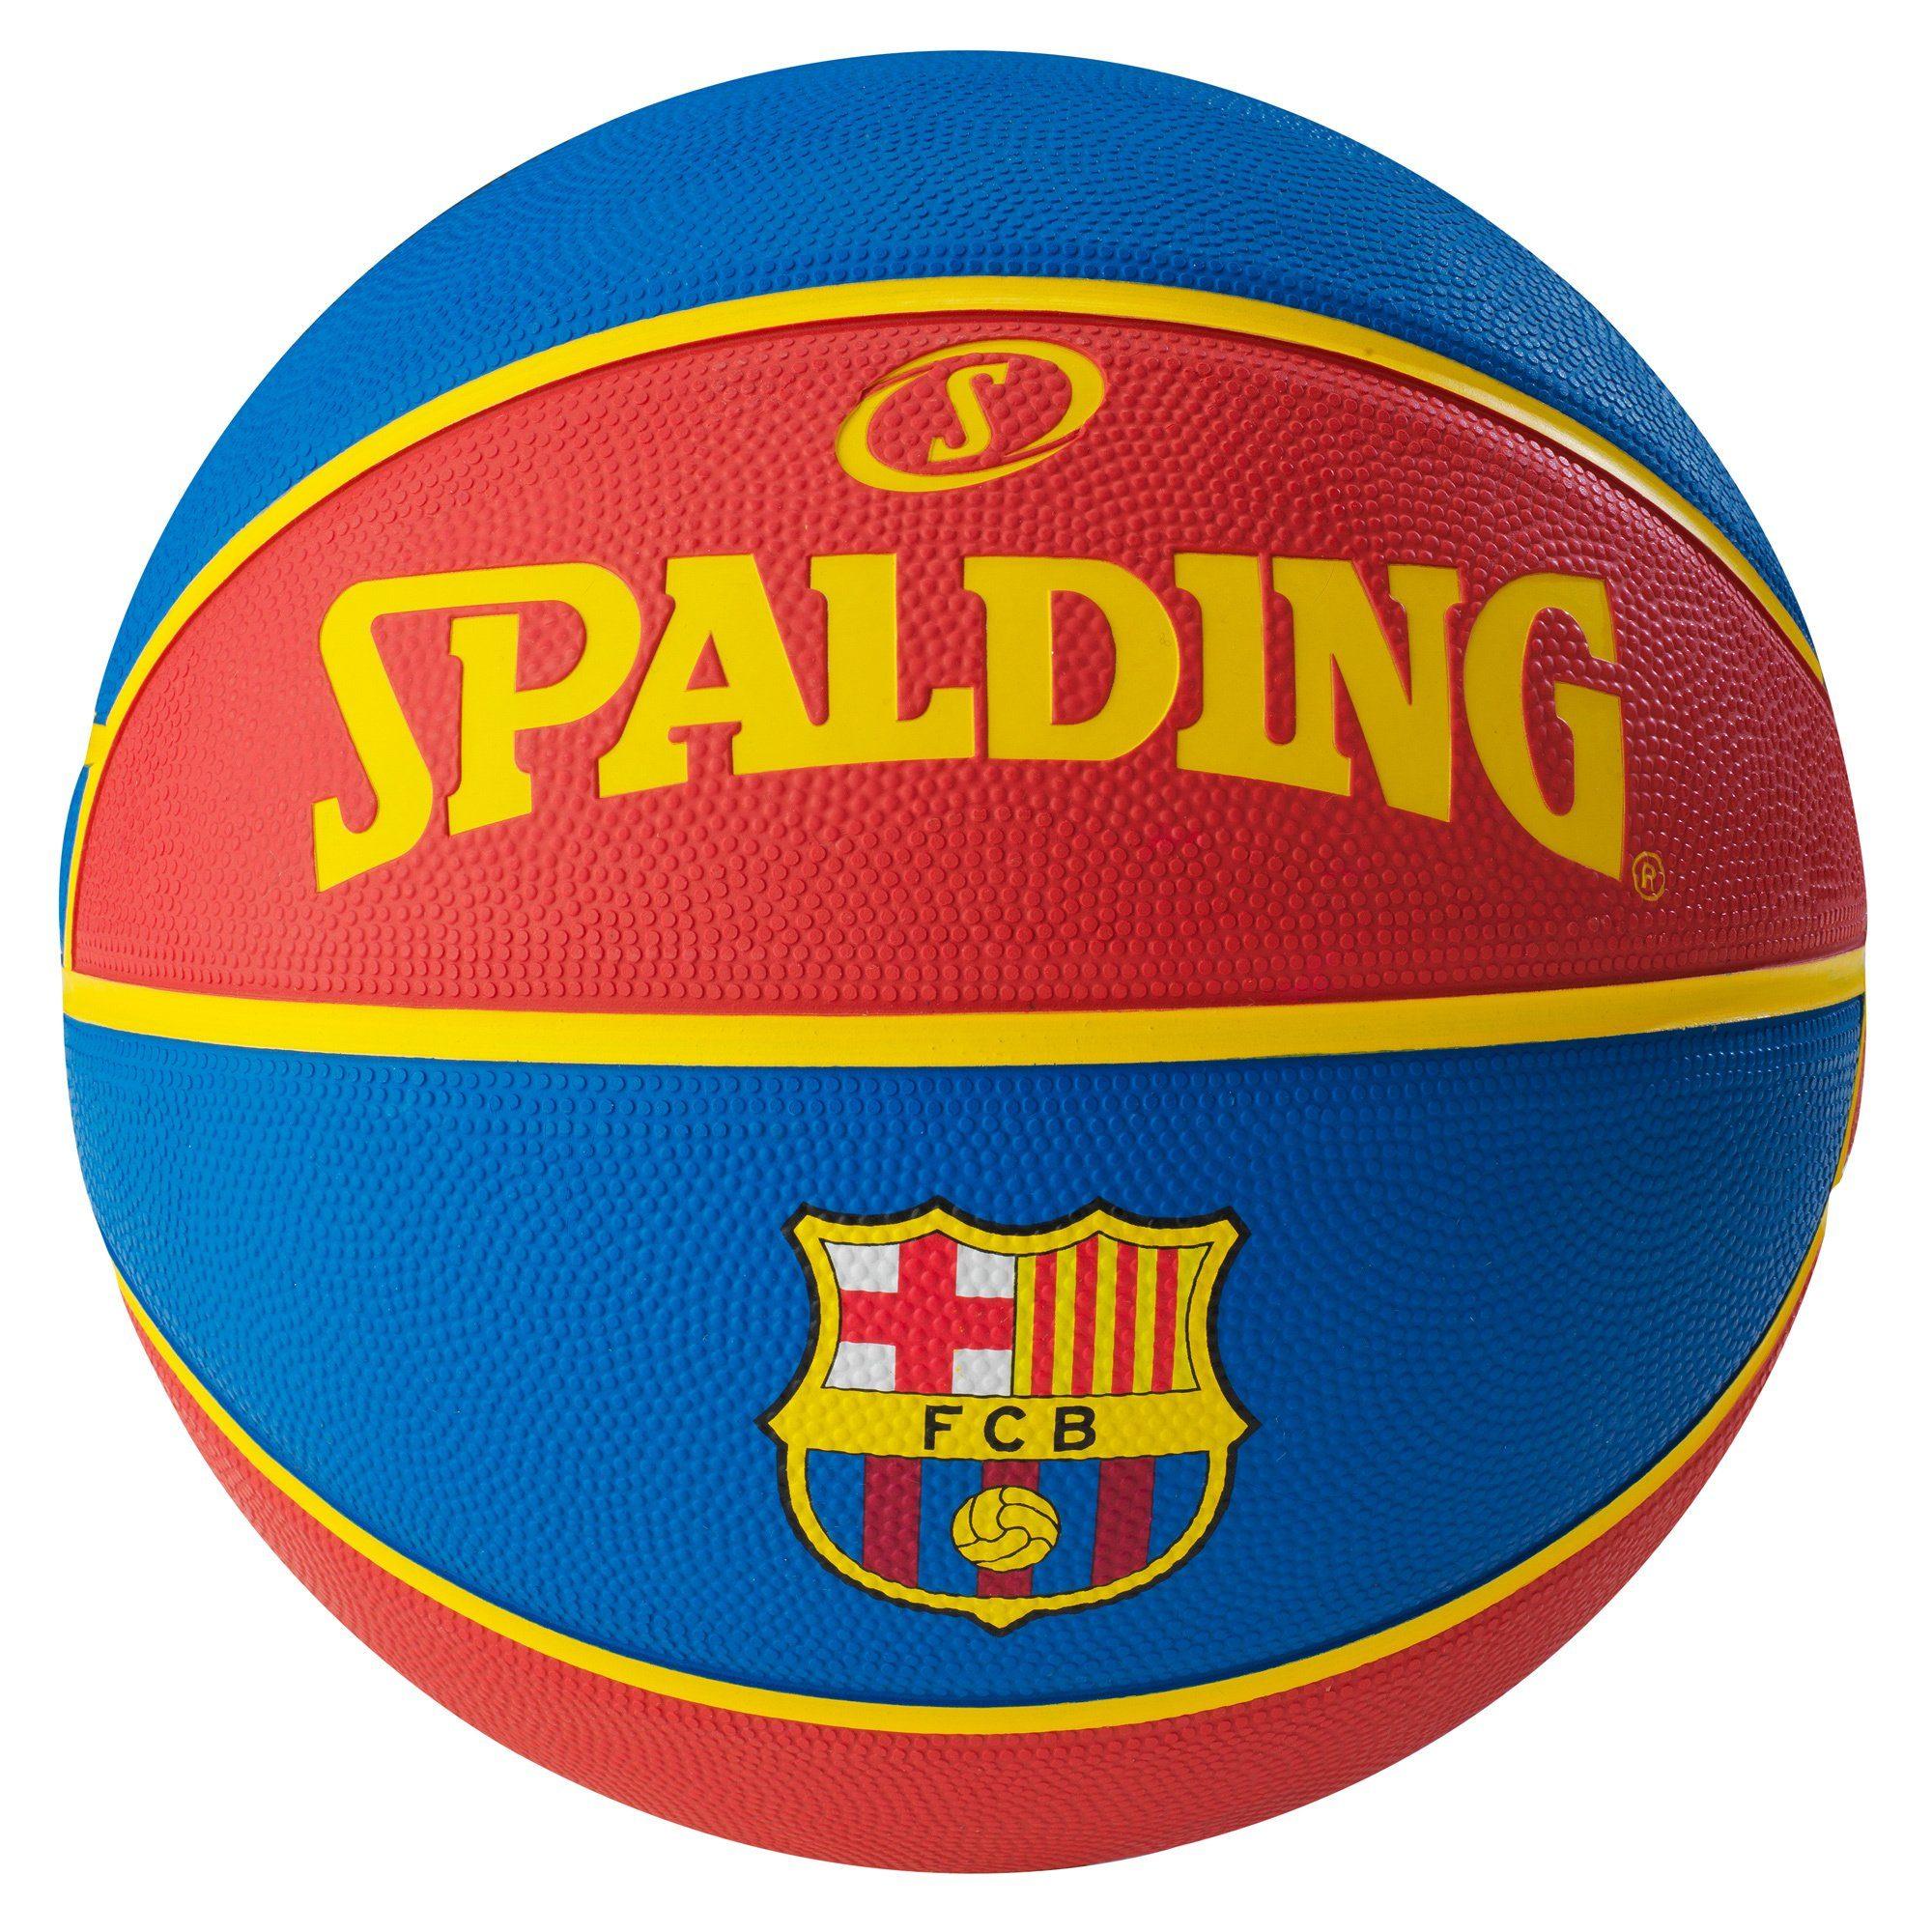 SPALDING EL Team FC Barcelona Basketball